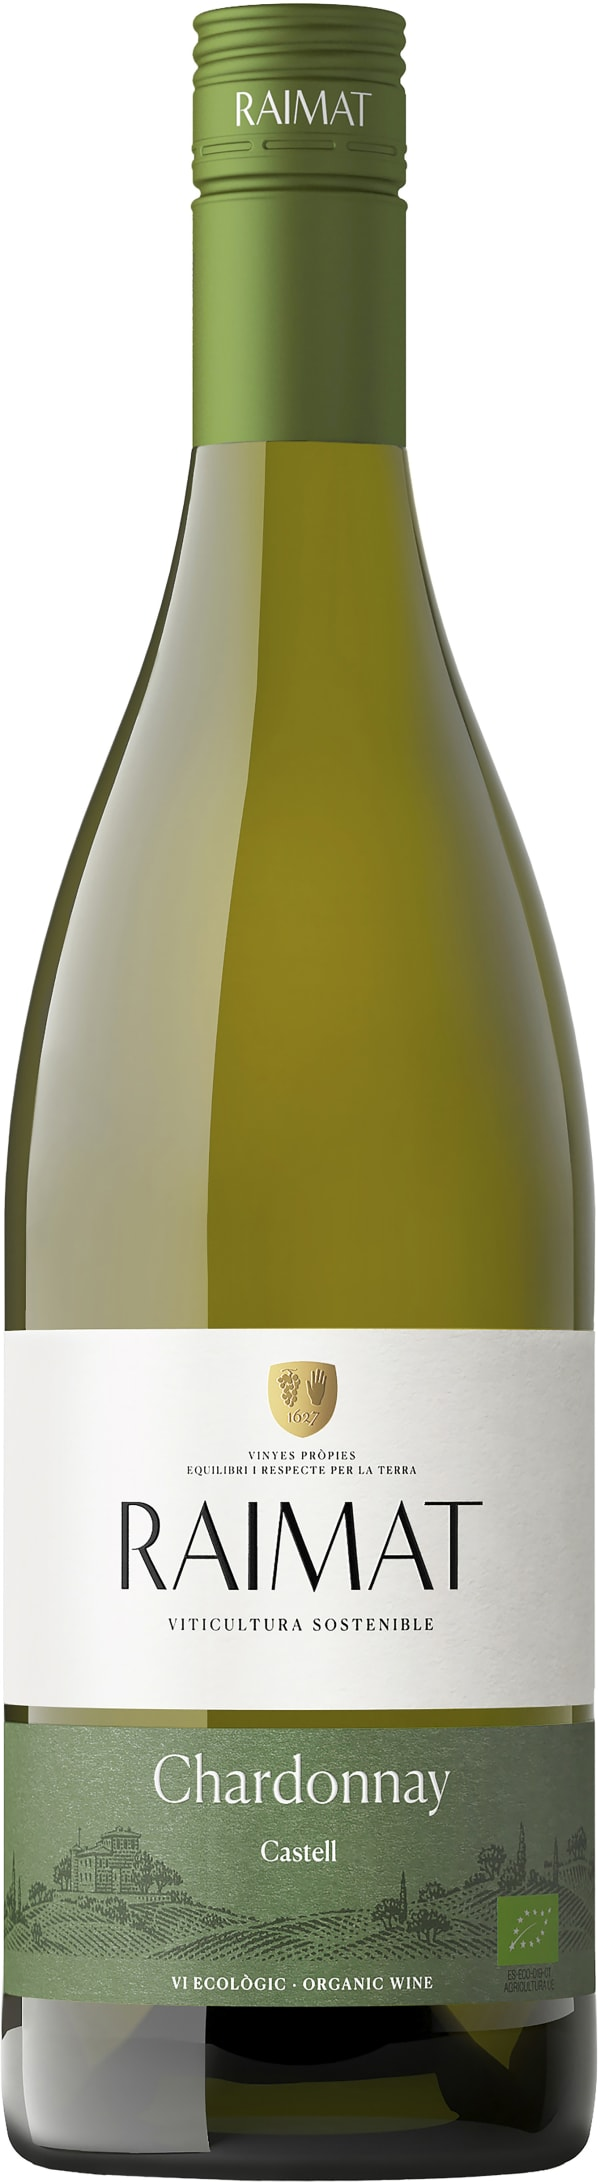 Raimat Castell Chardonnay 2016